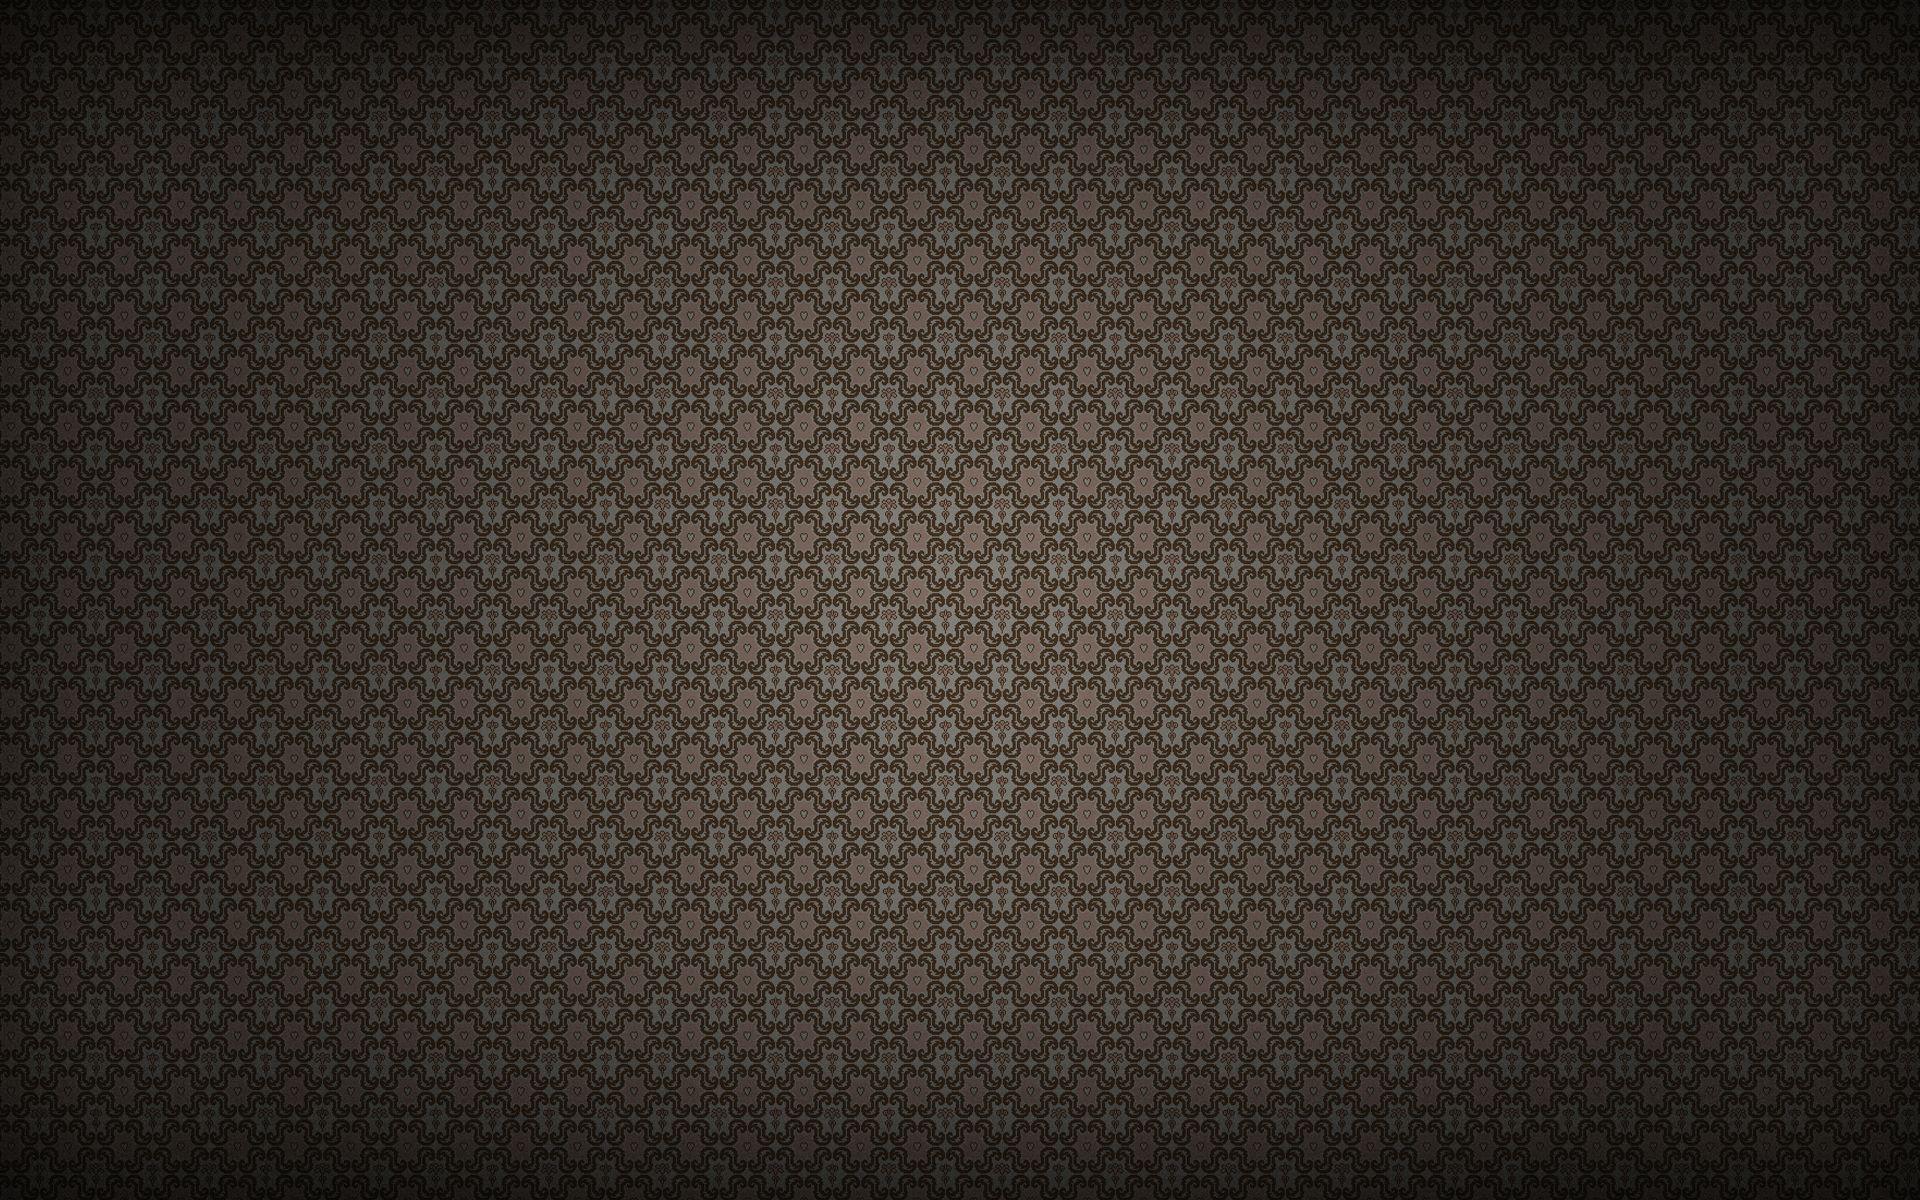 Hd Texture Wallpapers  Wallpaper Cave